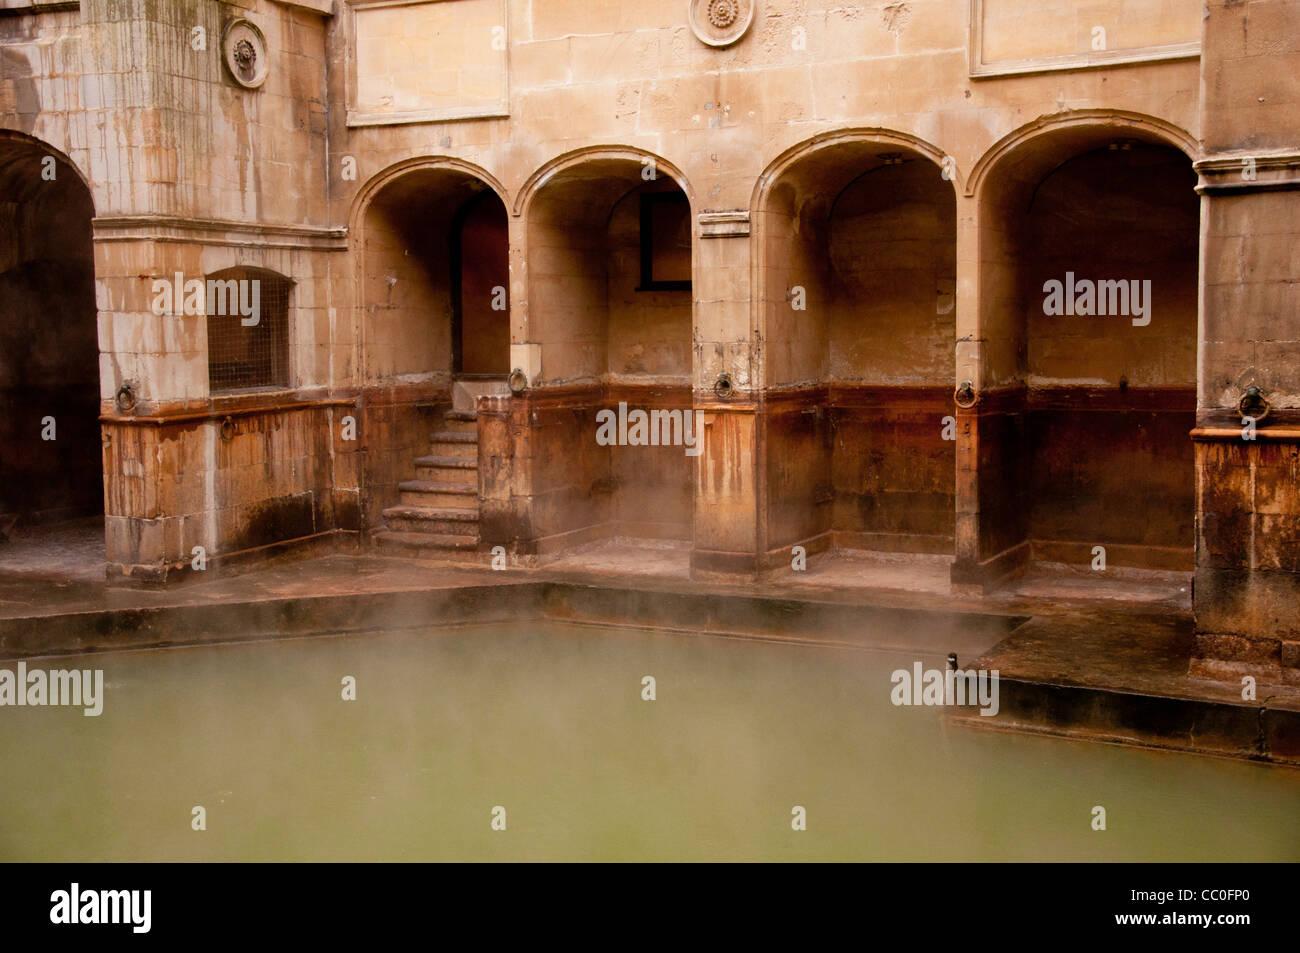 The Roman baths of the World Heritage City Bath, England UK. - Stock Image